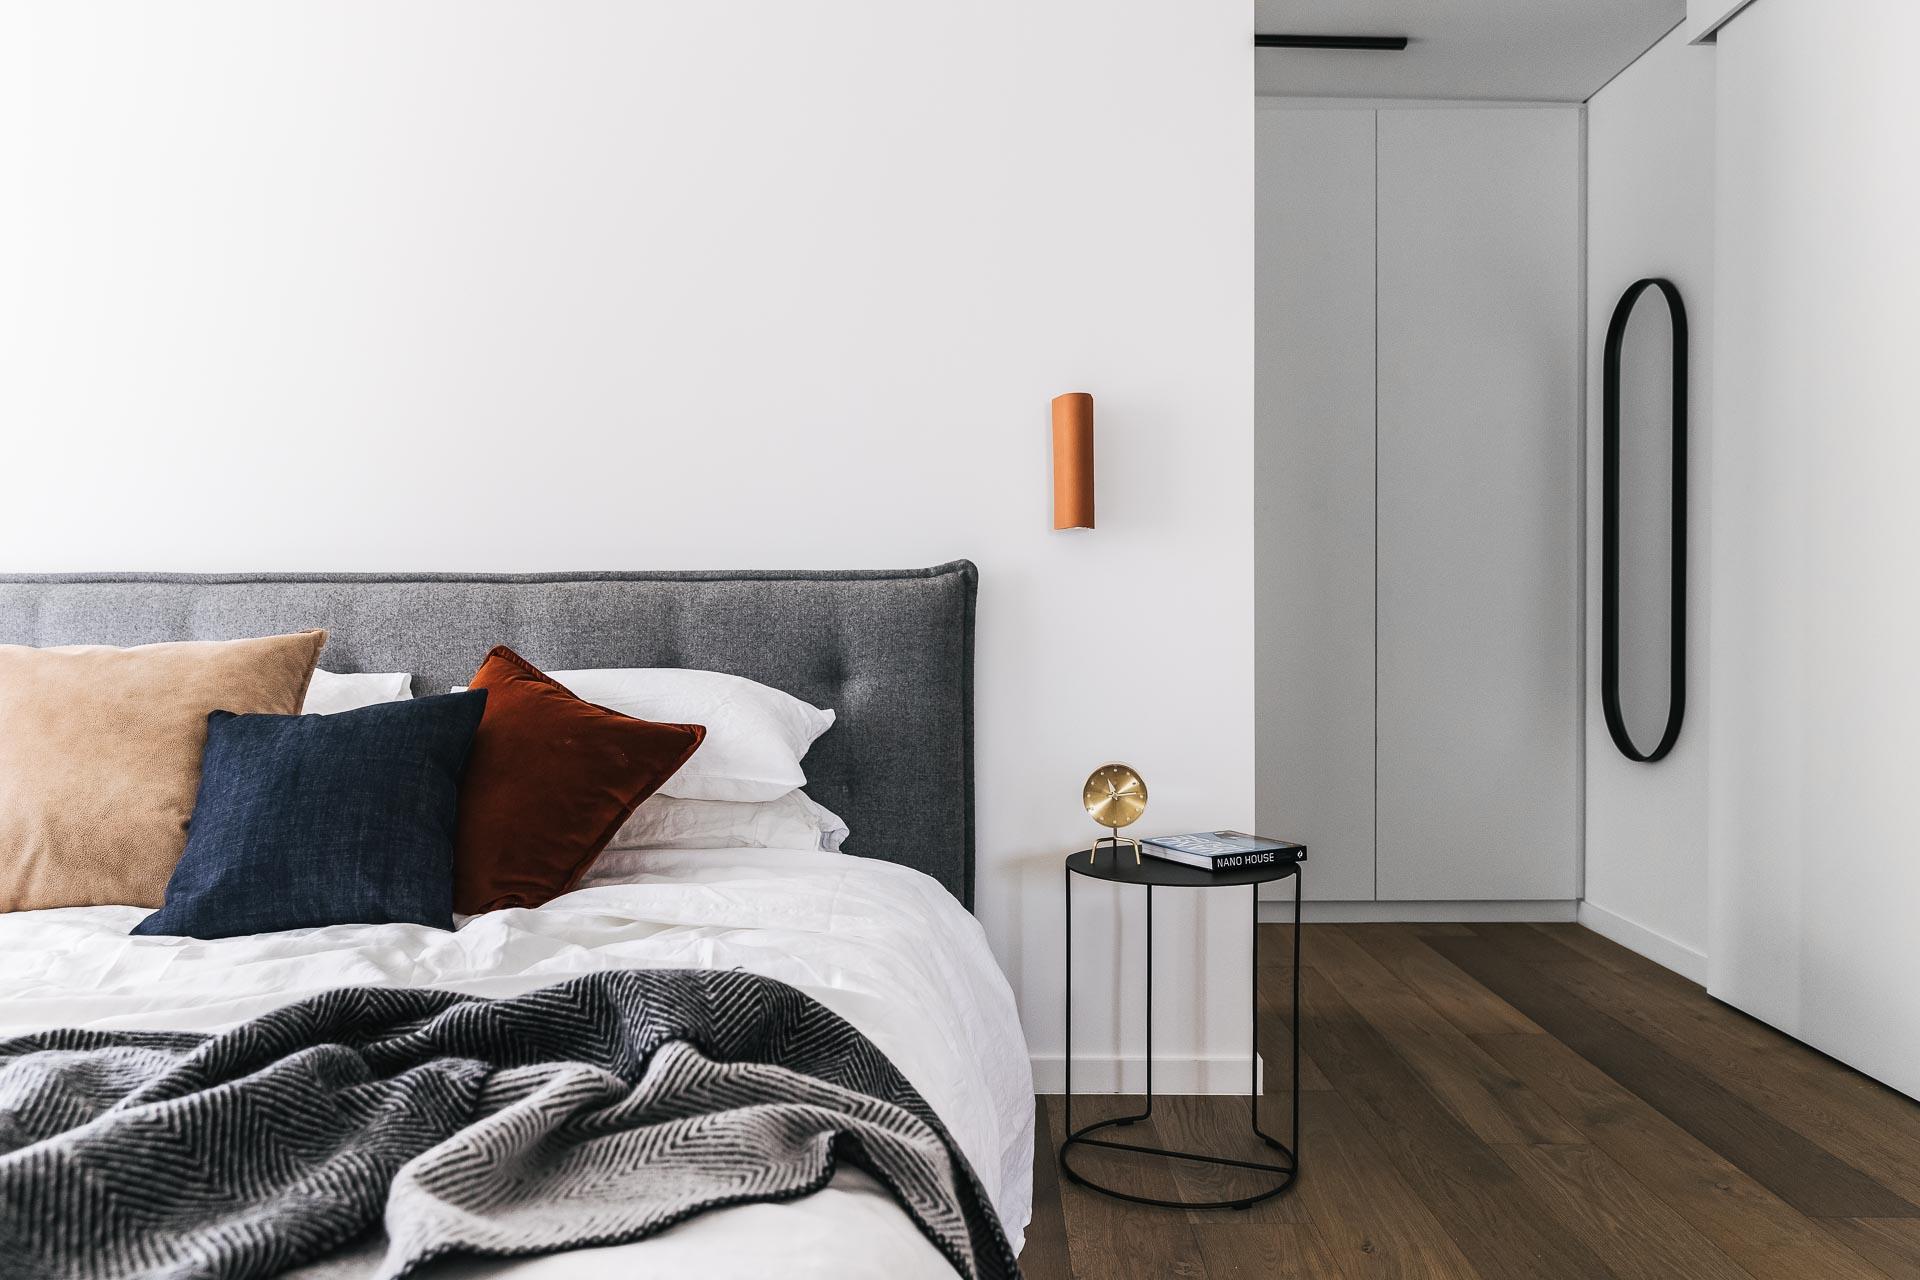 WEB - Architectural Photography Sydney - Open House Perth 2018  - Sebastian Photography 32.jpg